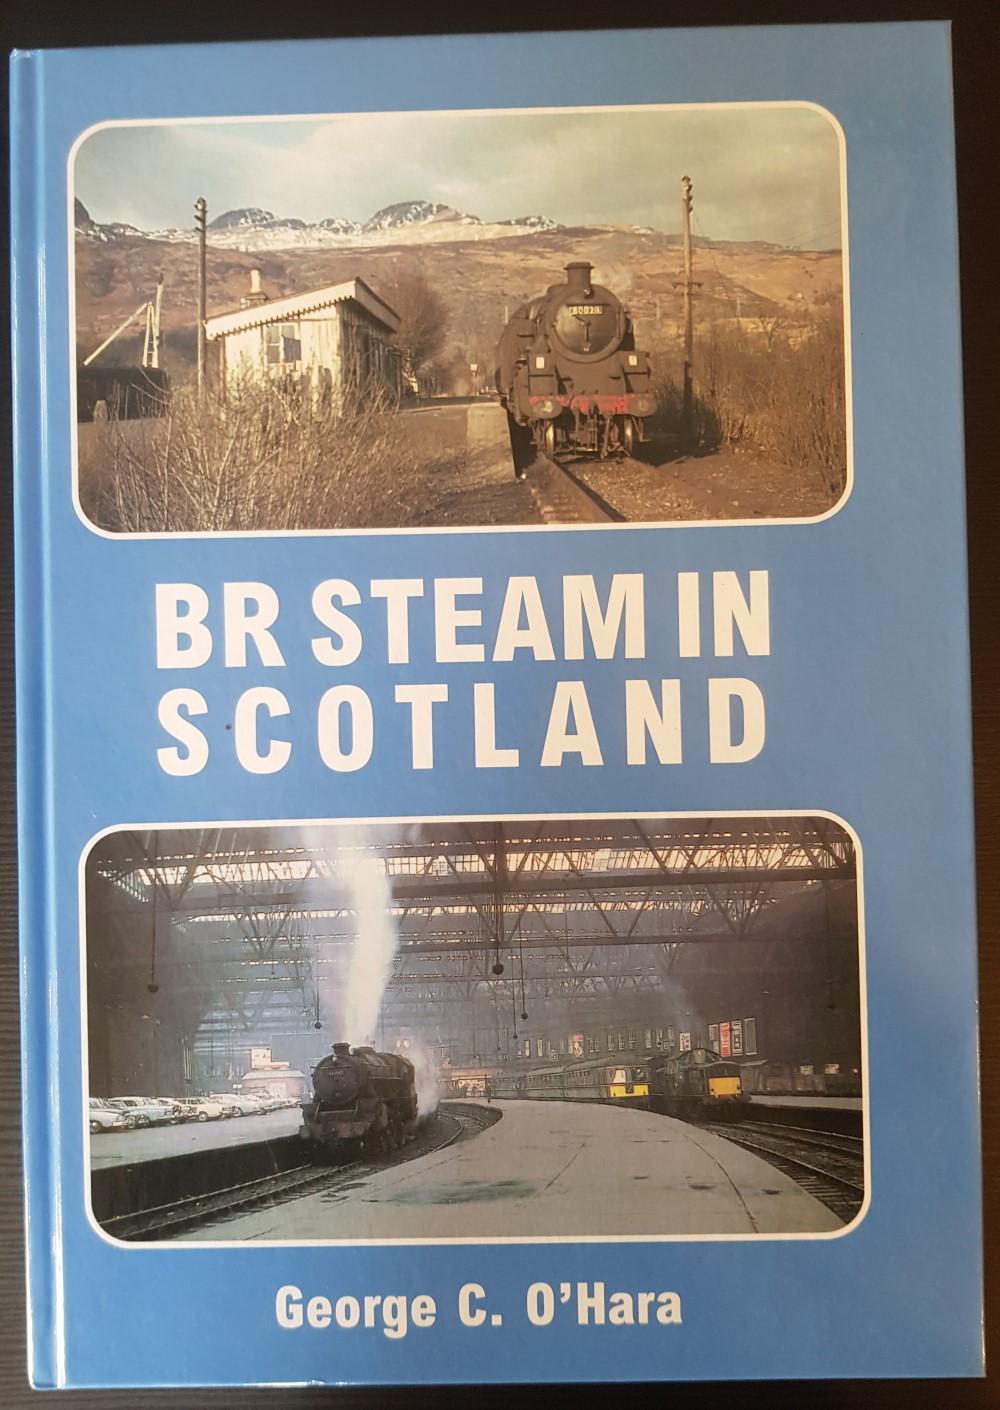 BR Steam in Scotland – George C. O'Hara